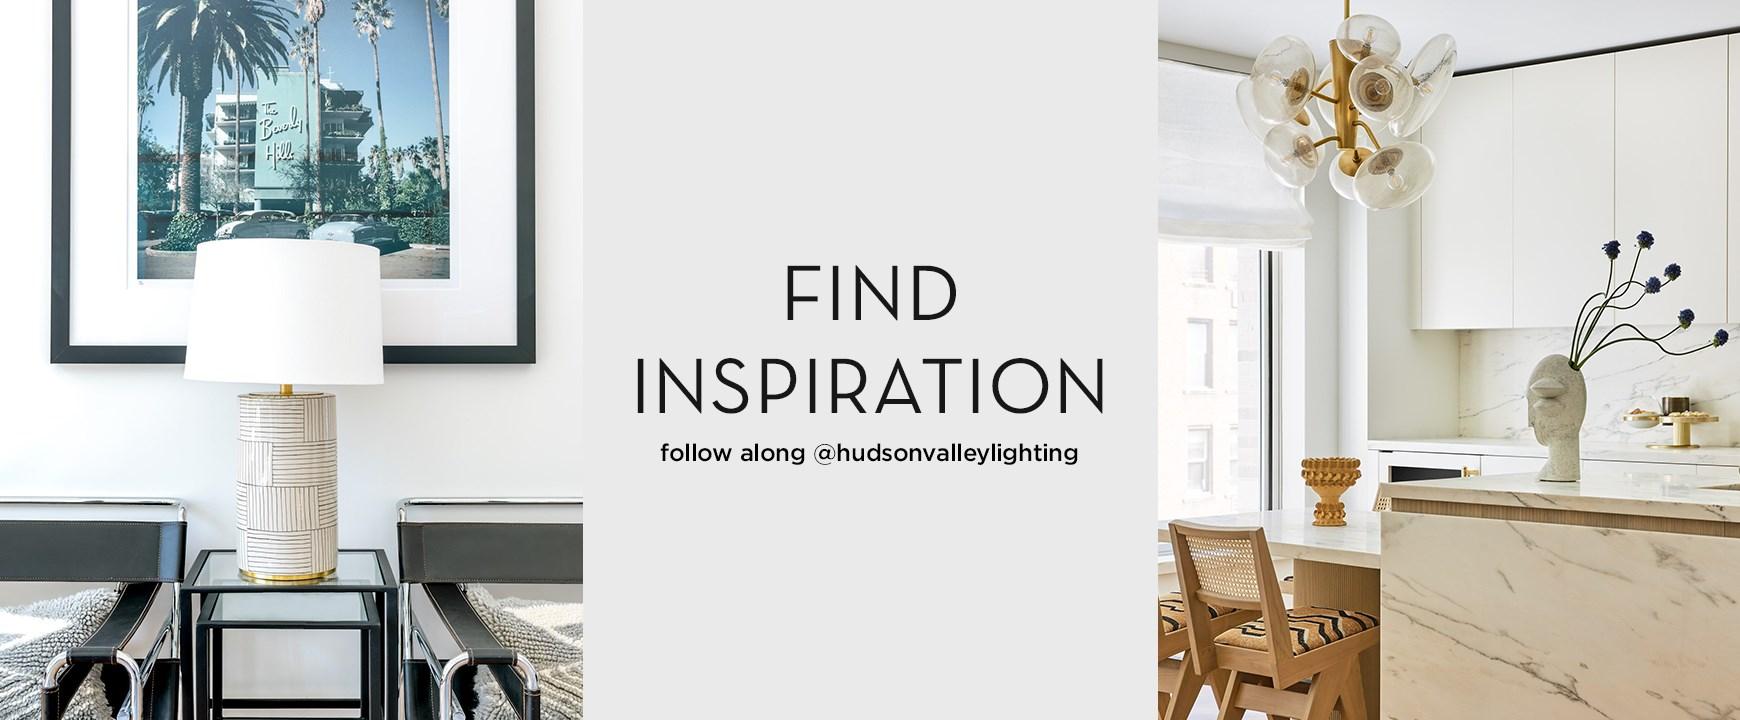 follow along @hudsonvalleylighting